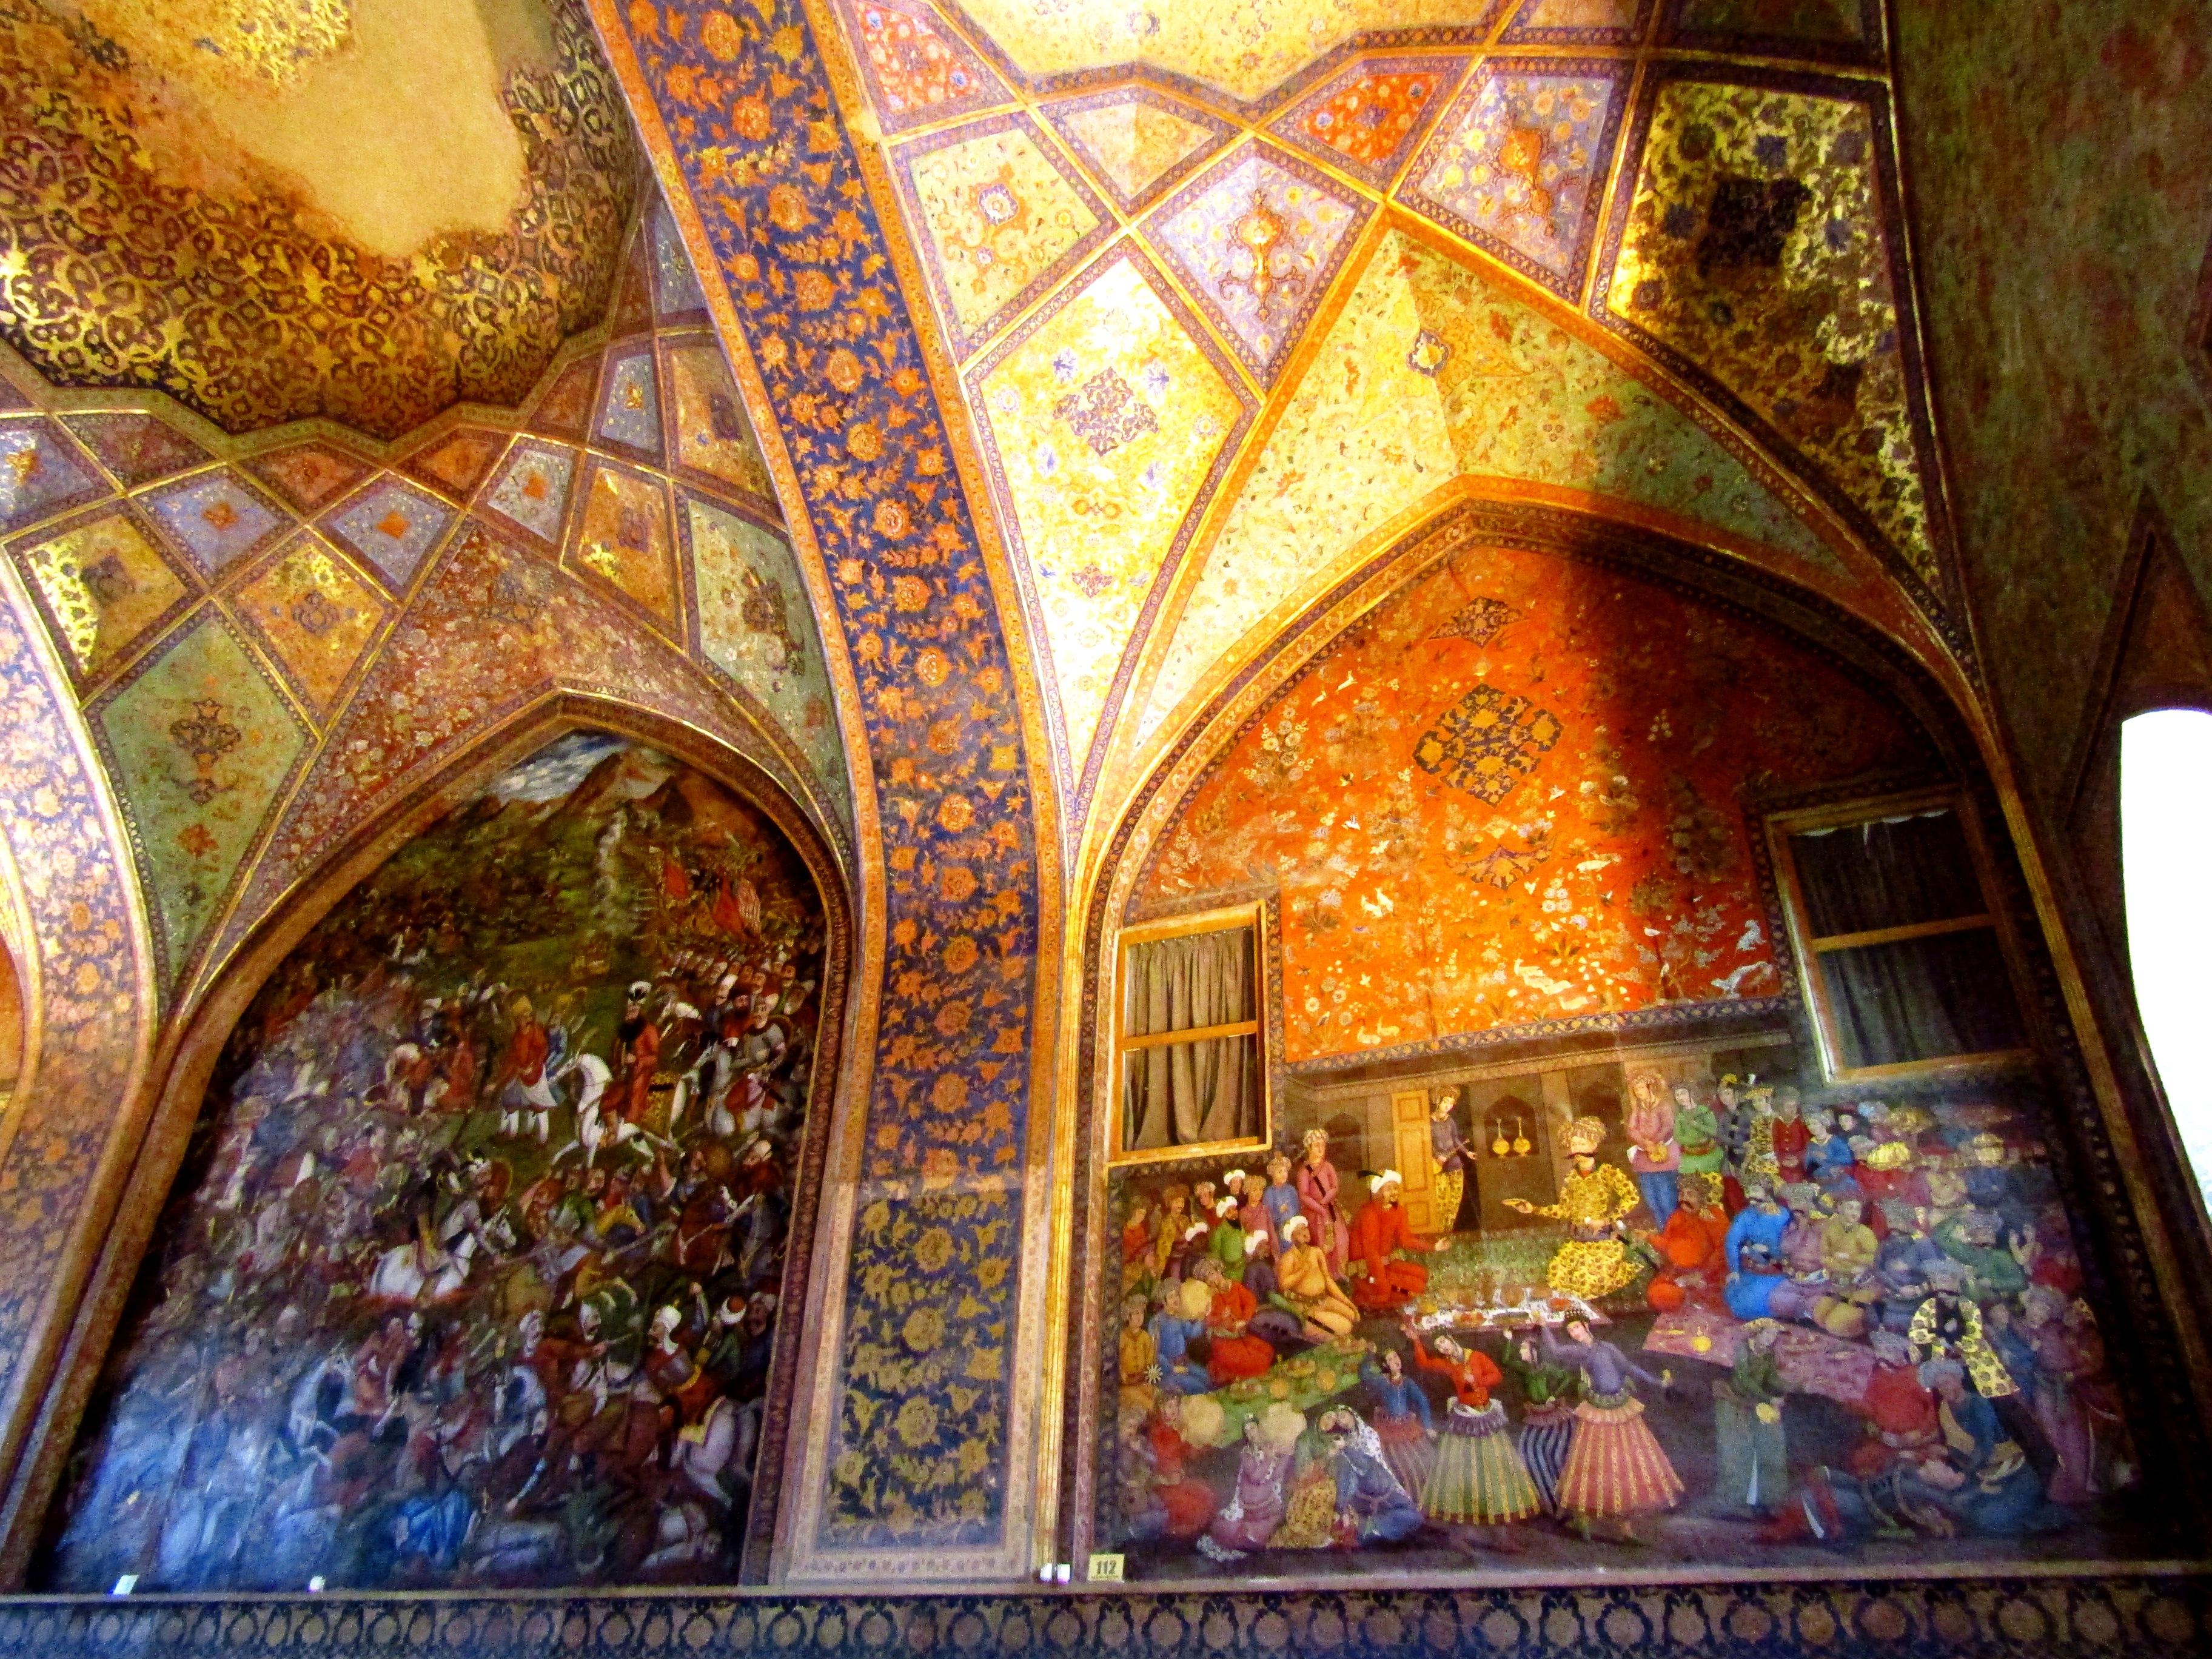 Murals in Chehel Sotoun Palace